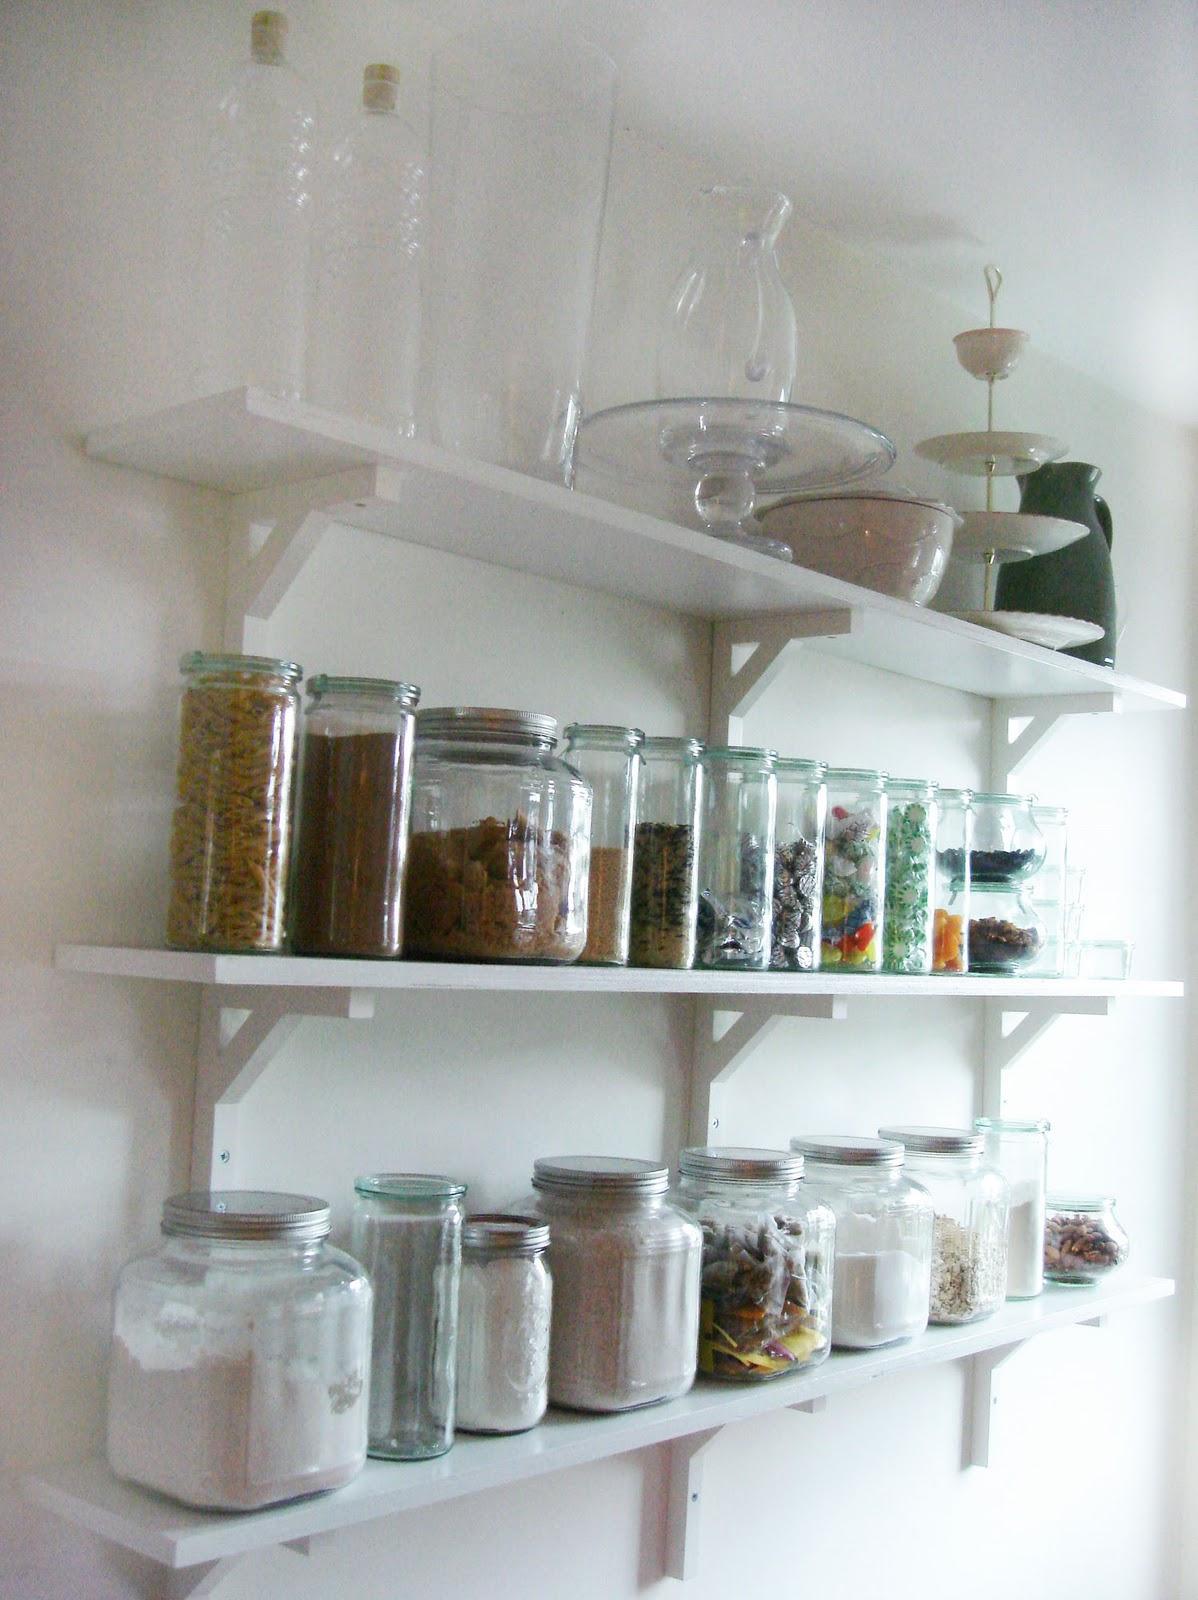 Kitchen Drawer Designs Linda Amp Harriett Home Improvements Kitchen Shelves